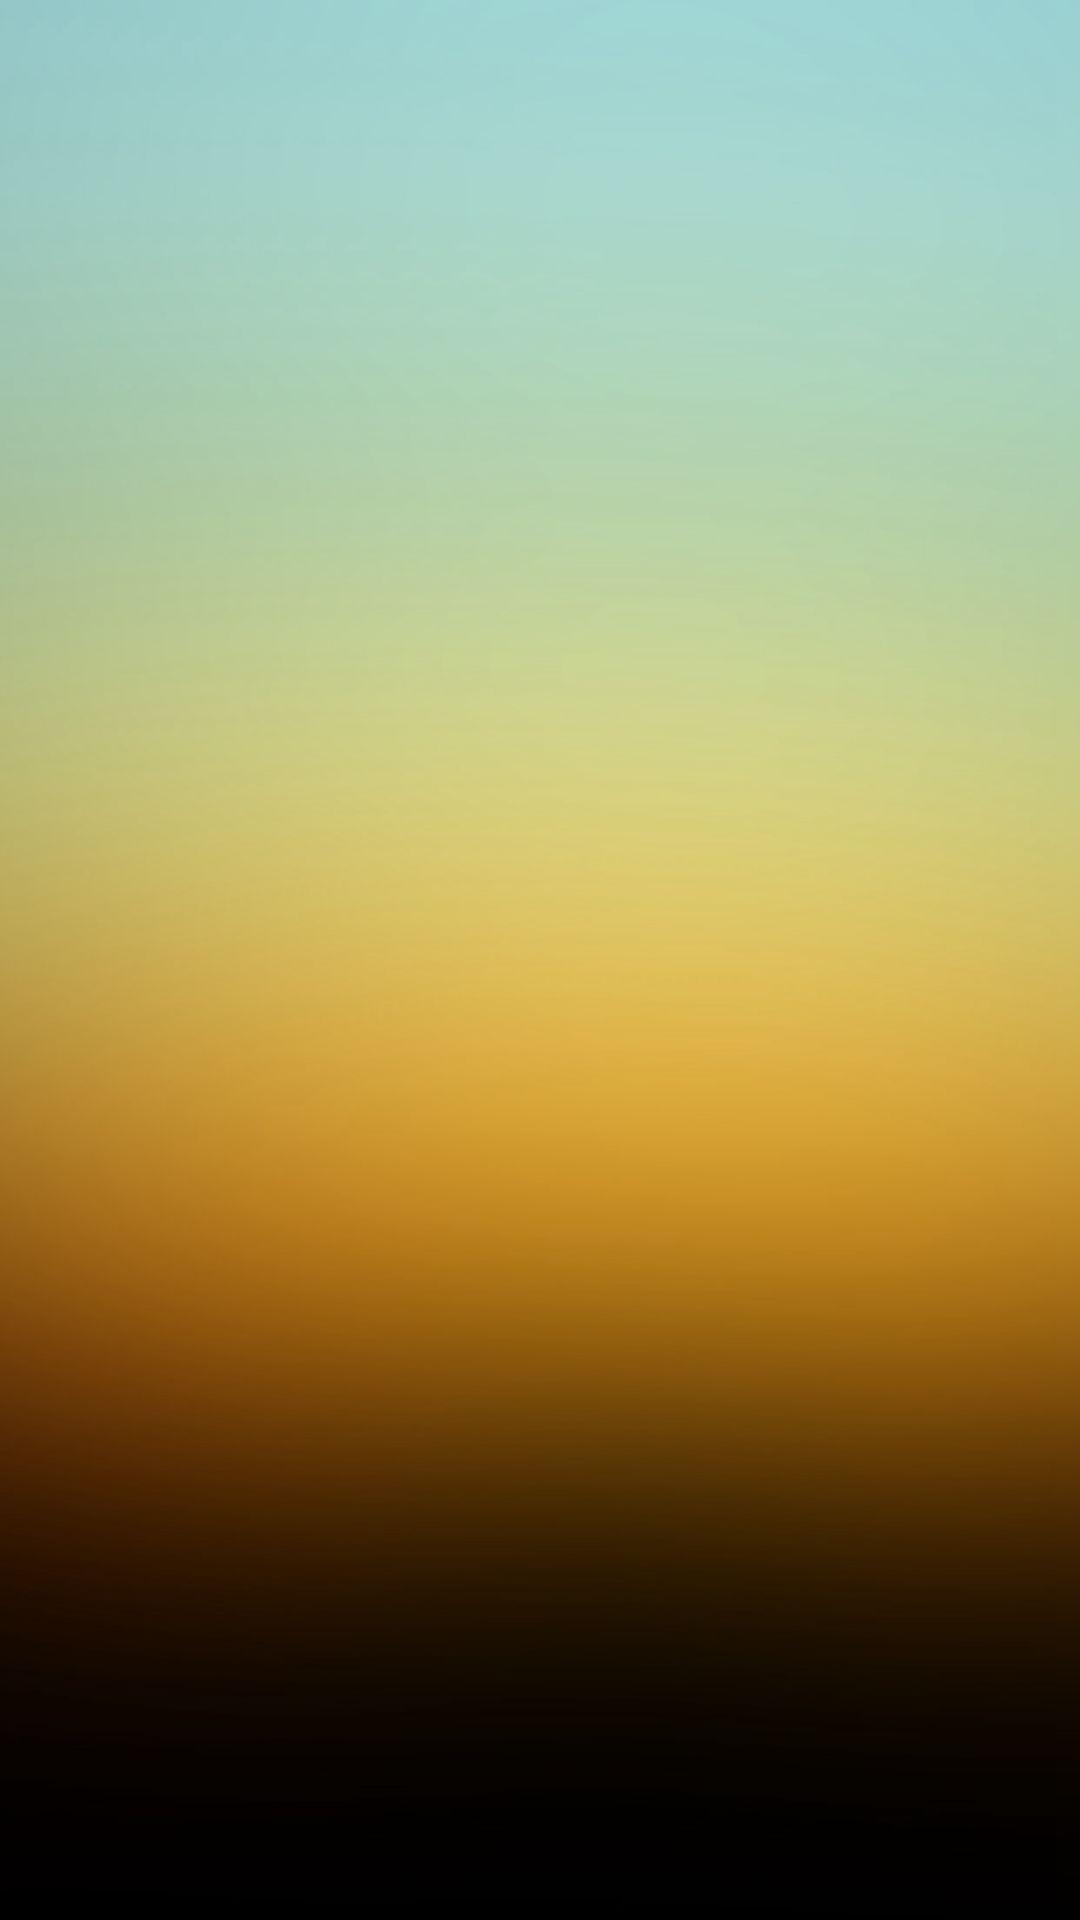 Love Field Yellow Gradation Blur Iphone 6 Plus Wallpaper